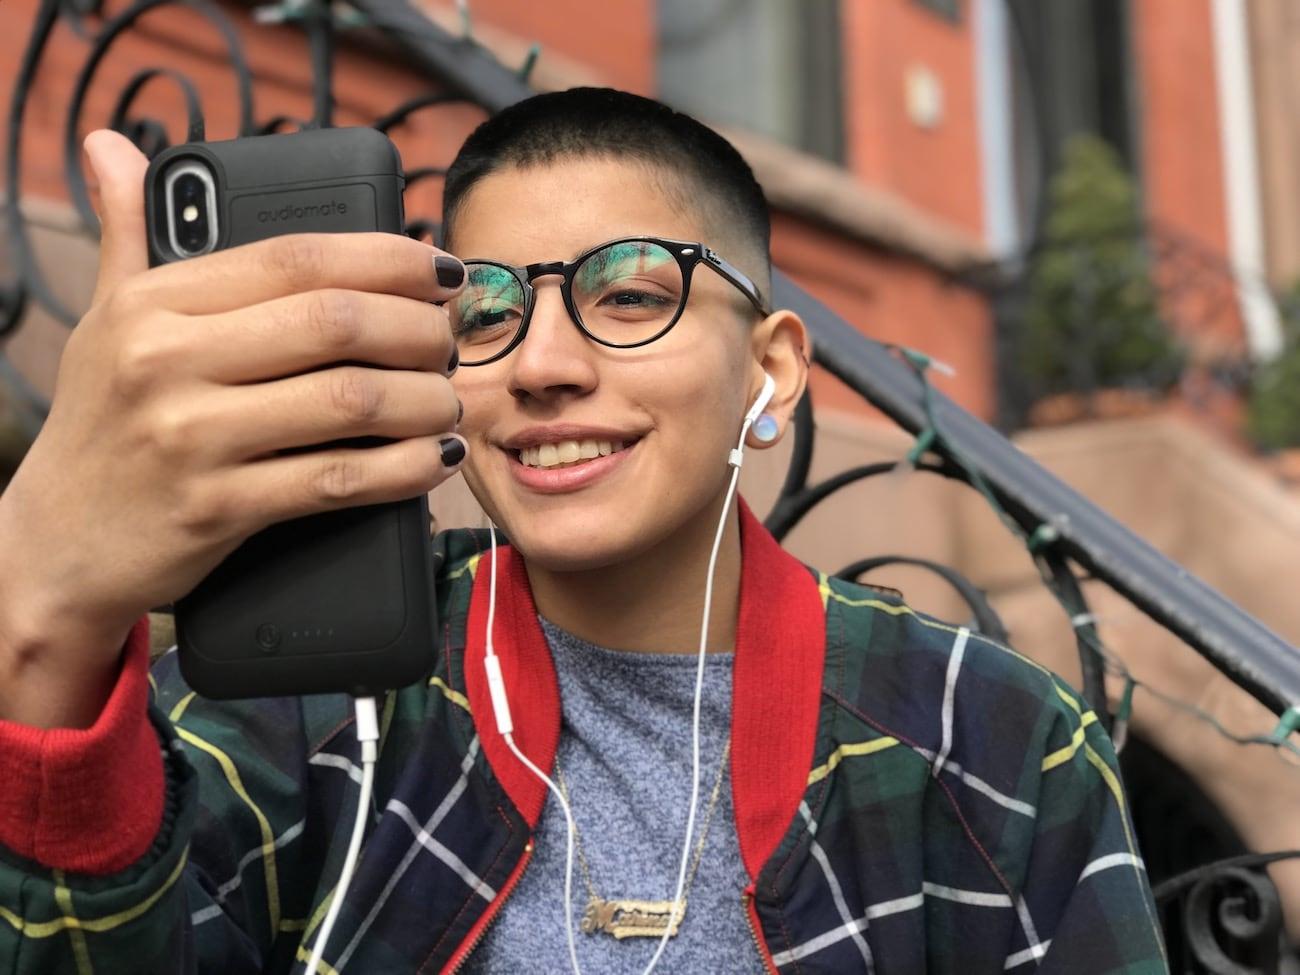 AudioMod iPhone Audio Jack Battery Case